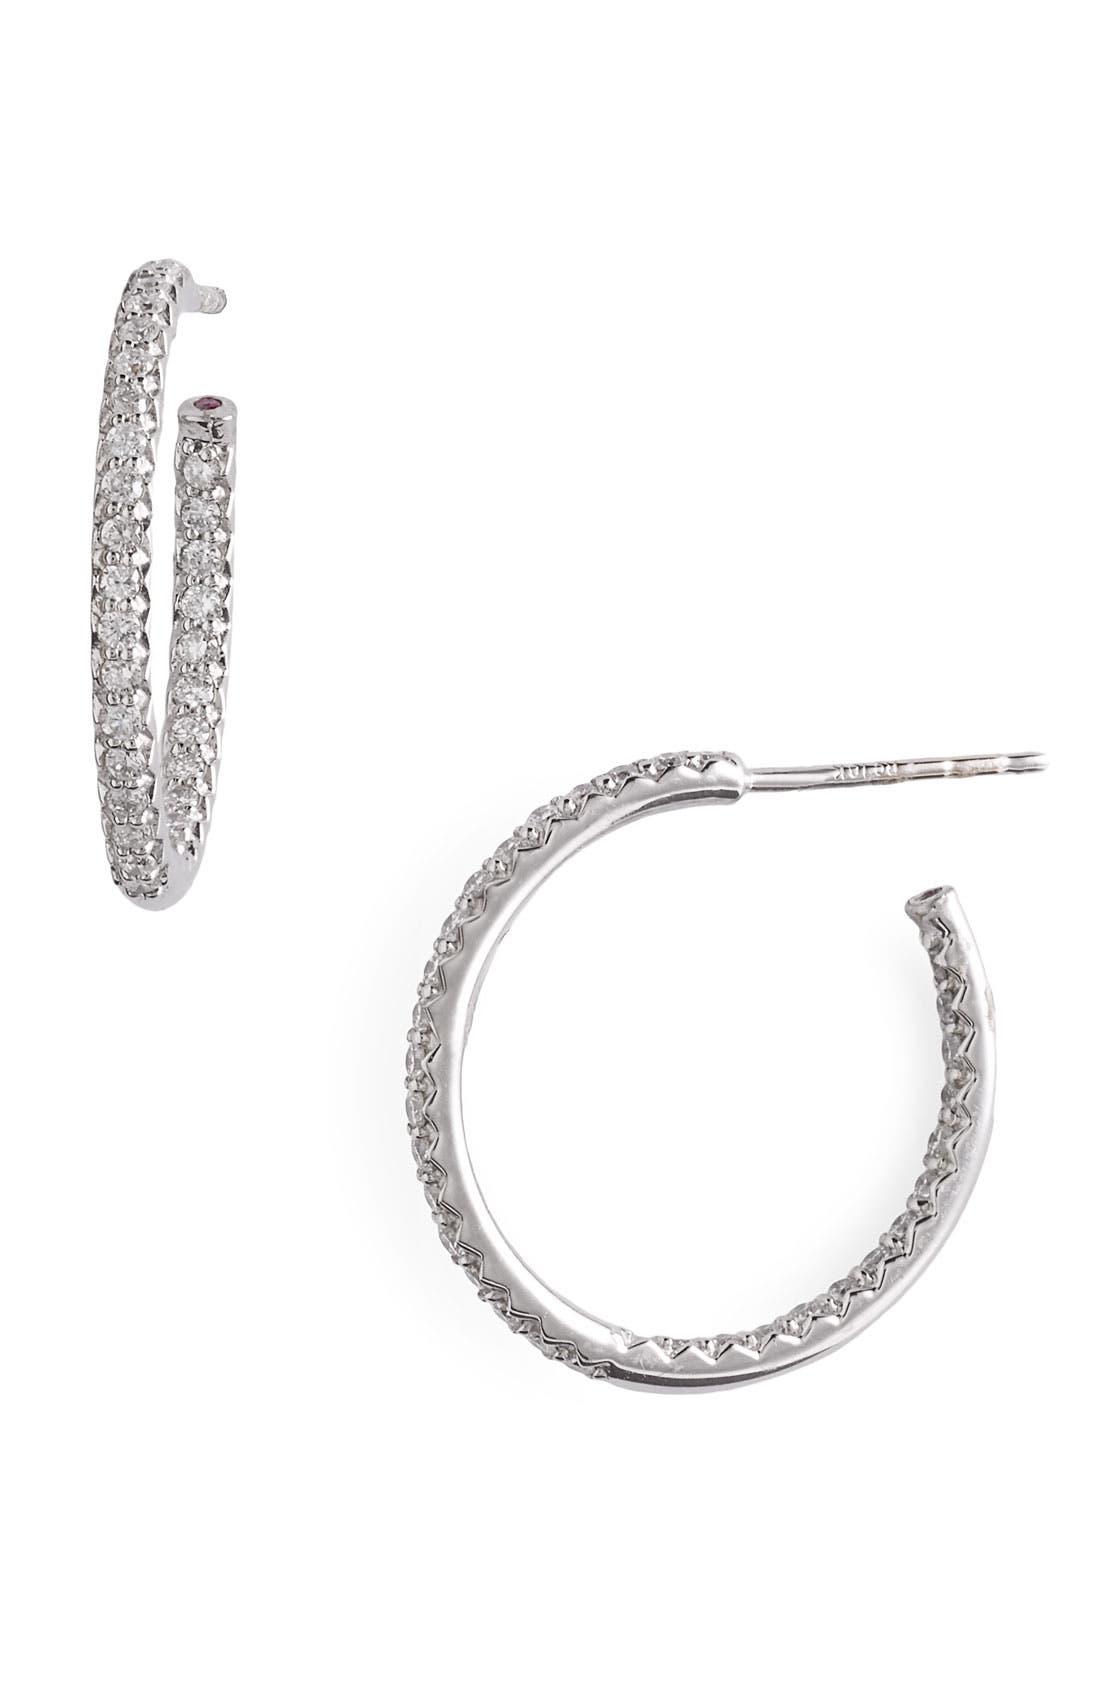 Main Image - Roberto Coin Micropavé Diamond Hoop Earrings